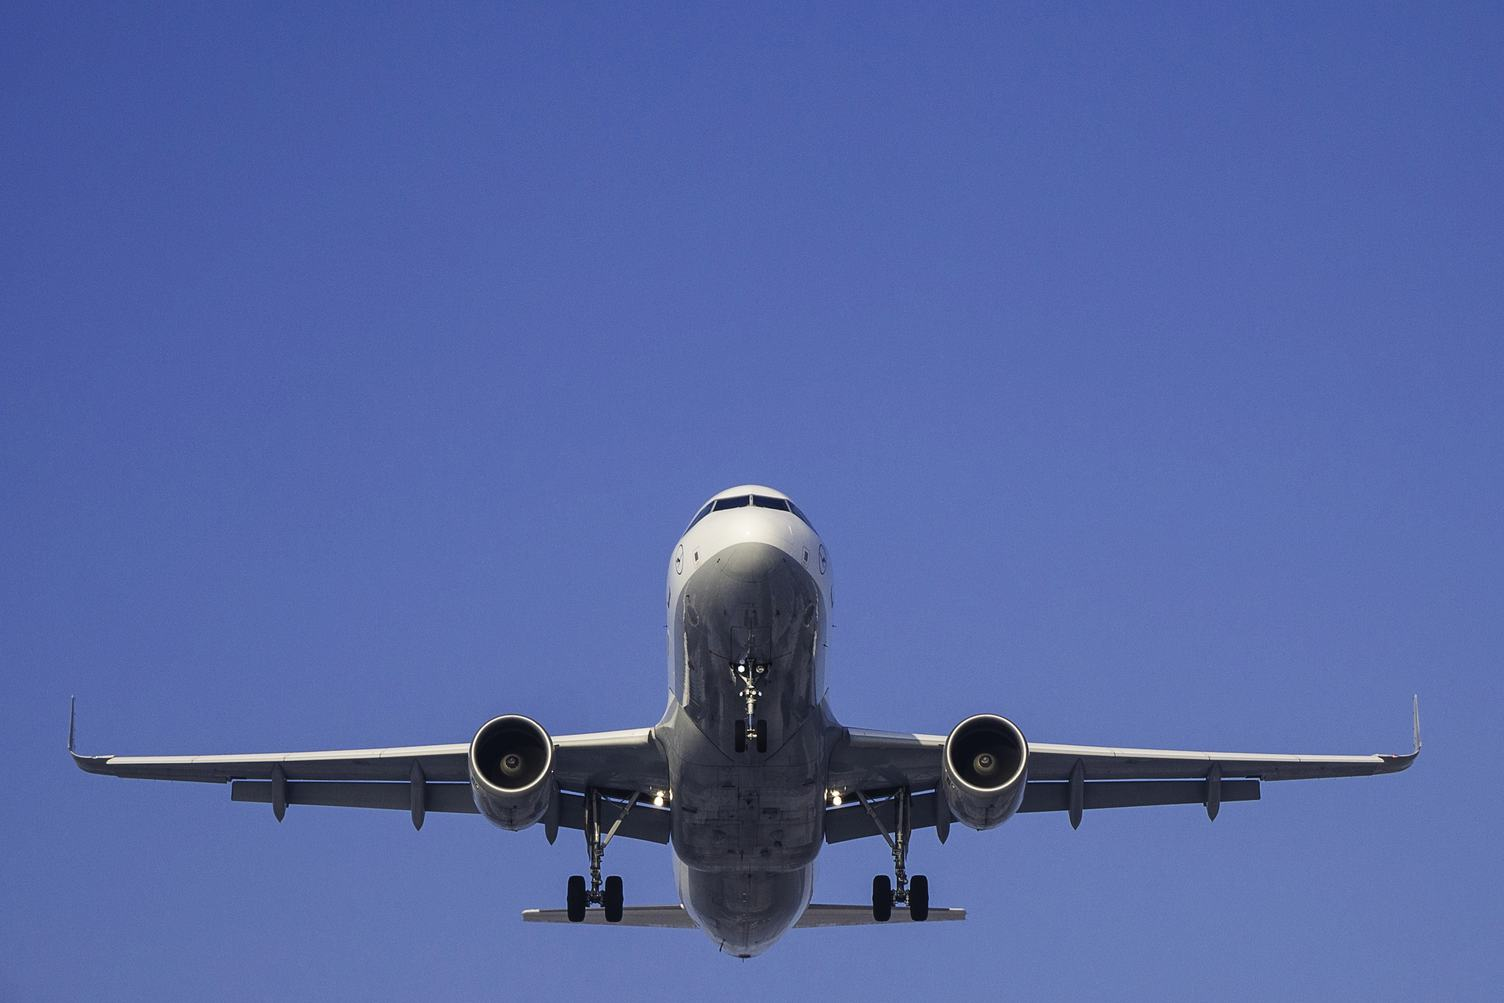 Plane against Blue Sky